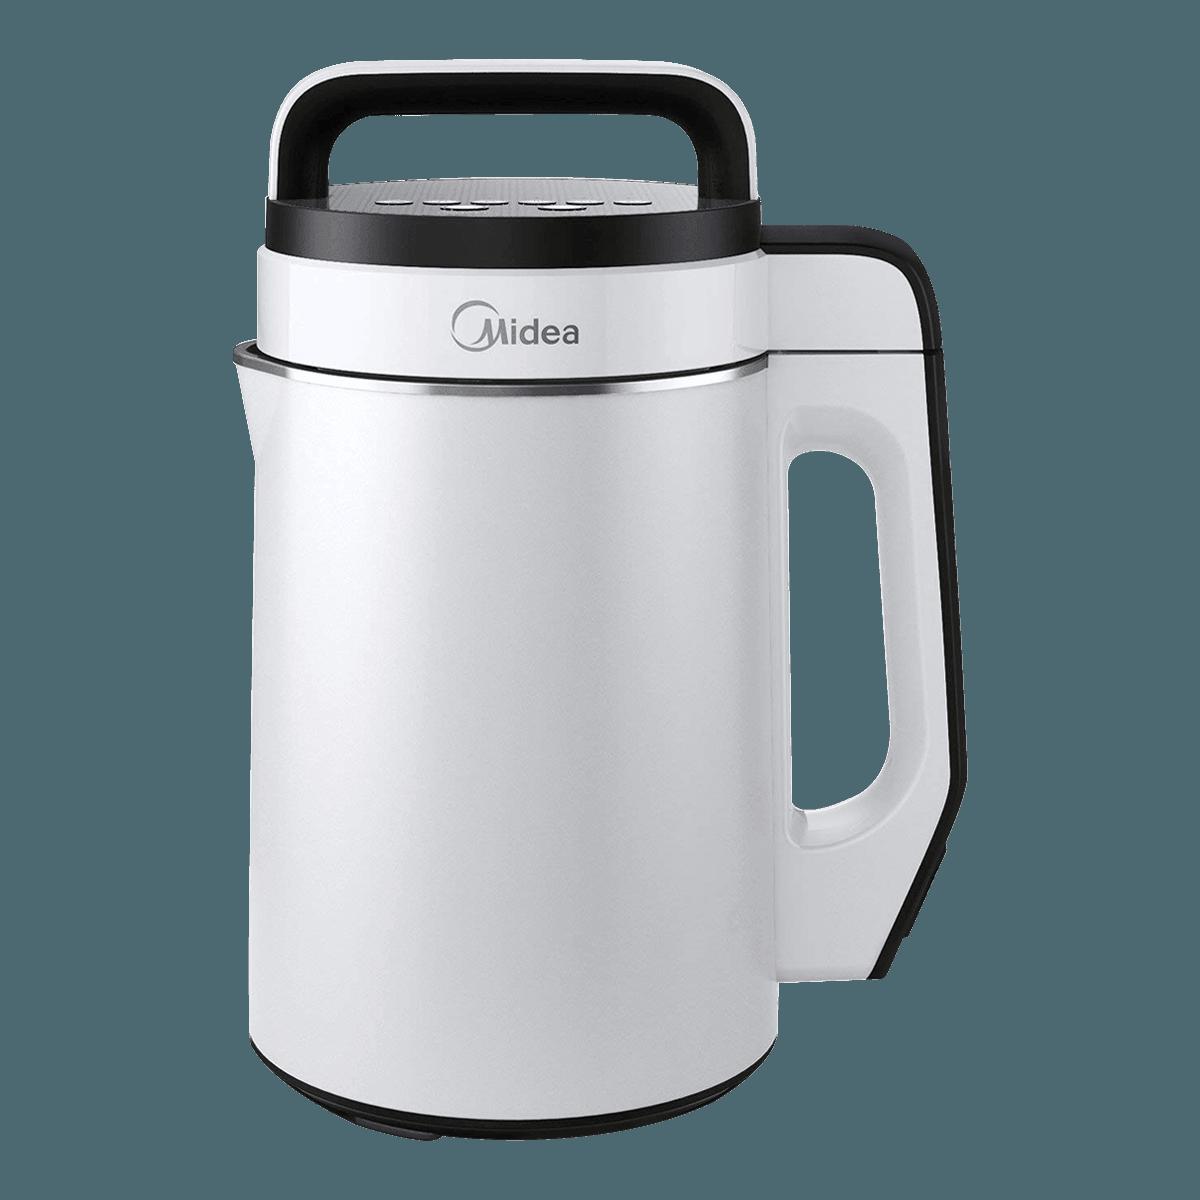 MIDEA美的 全自动多功能不锈钢双层豆浆机 1.7L MNRG17-W